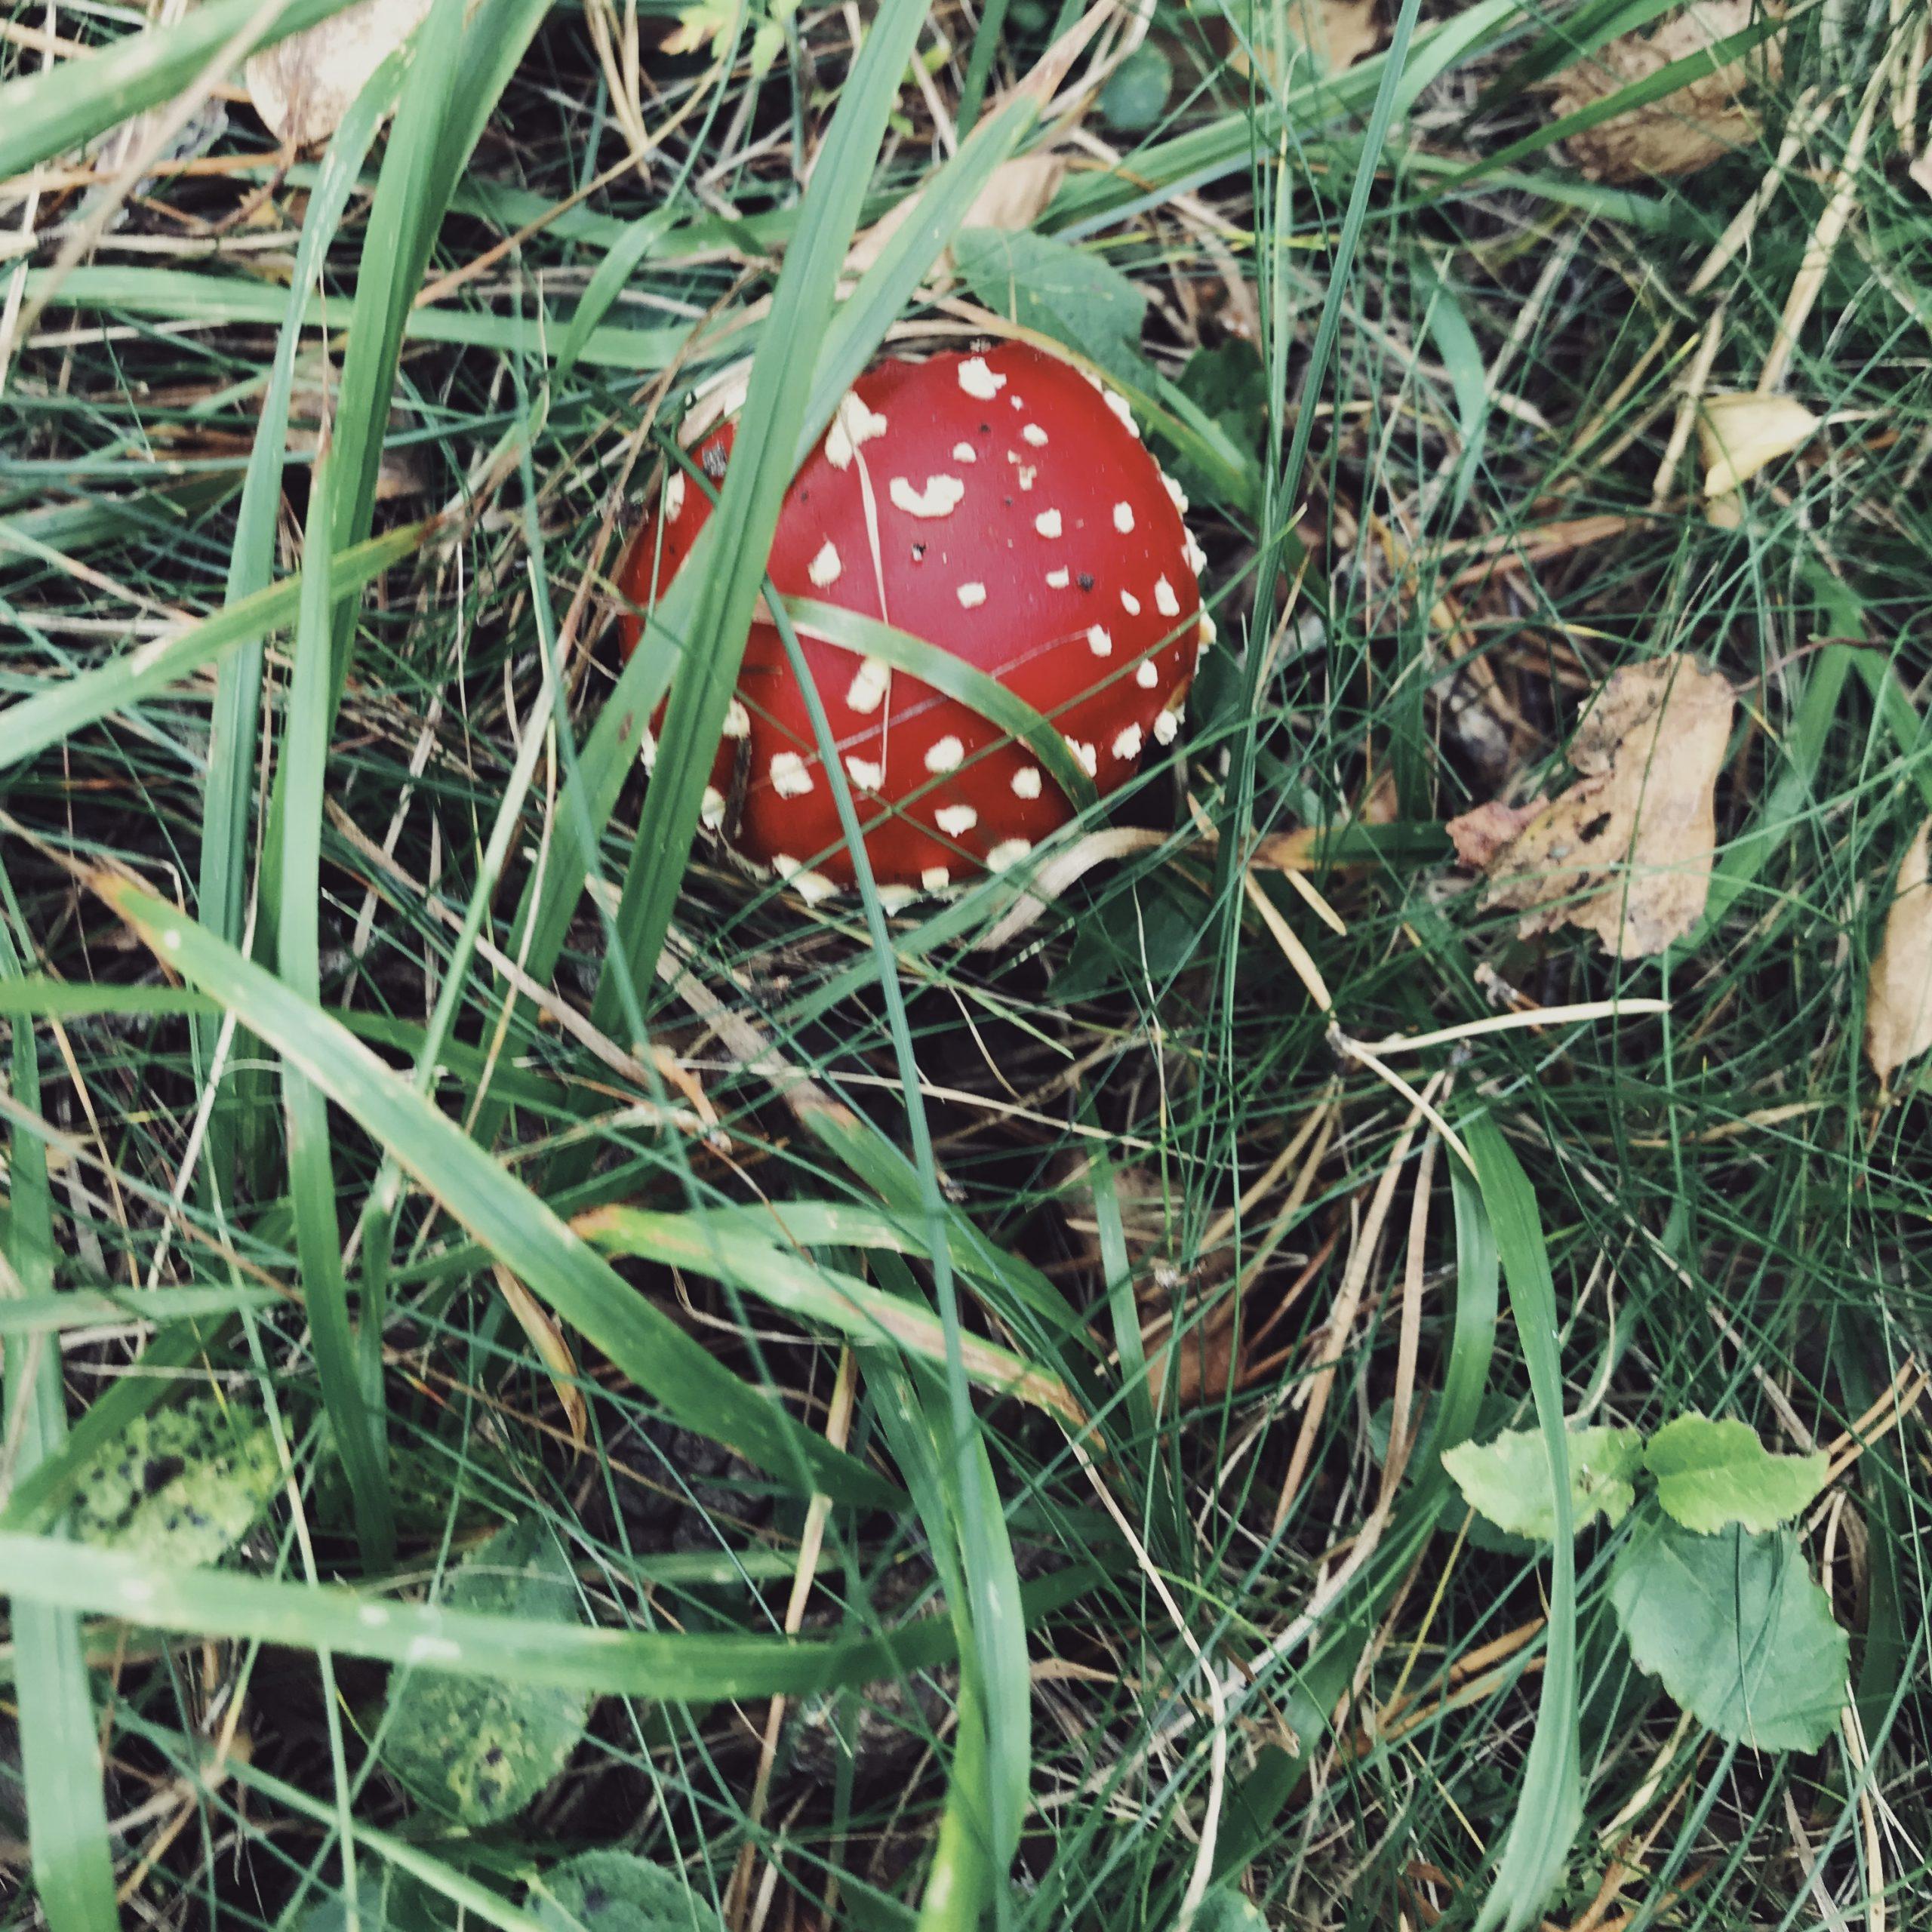 mushroom-flugsvamp-skog-forrest-nature-skräp